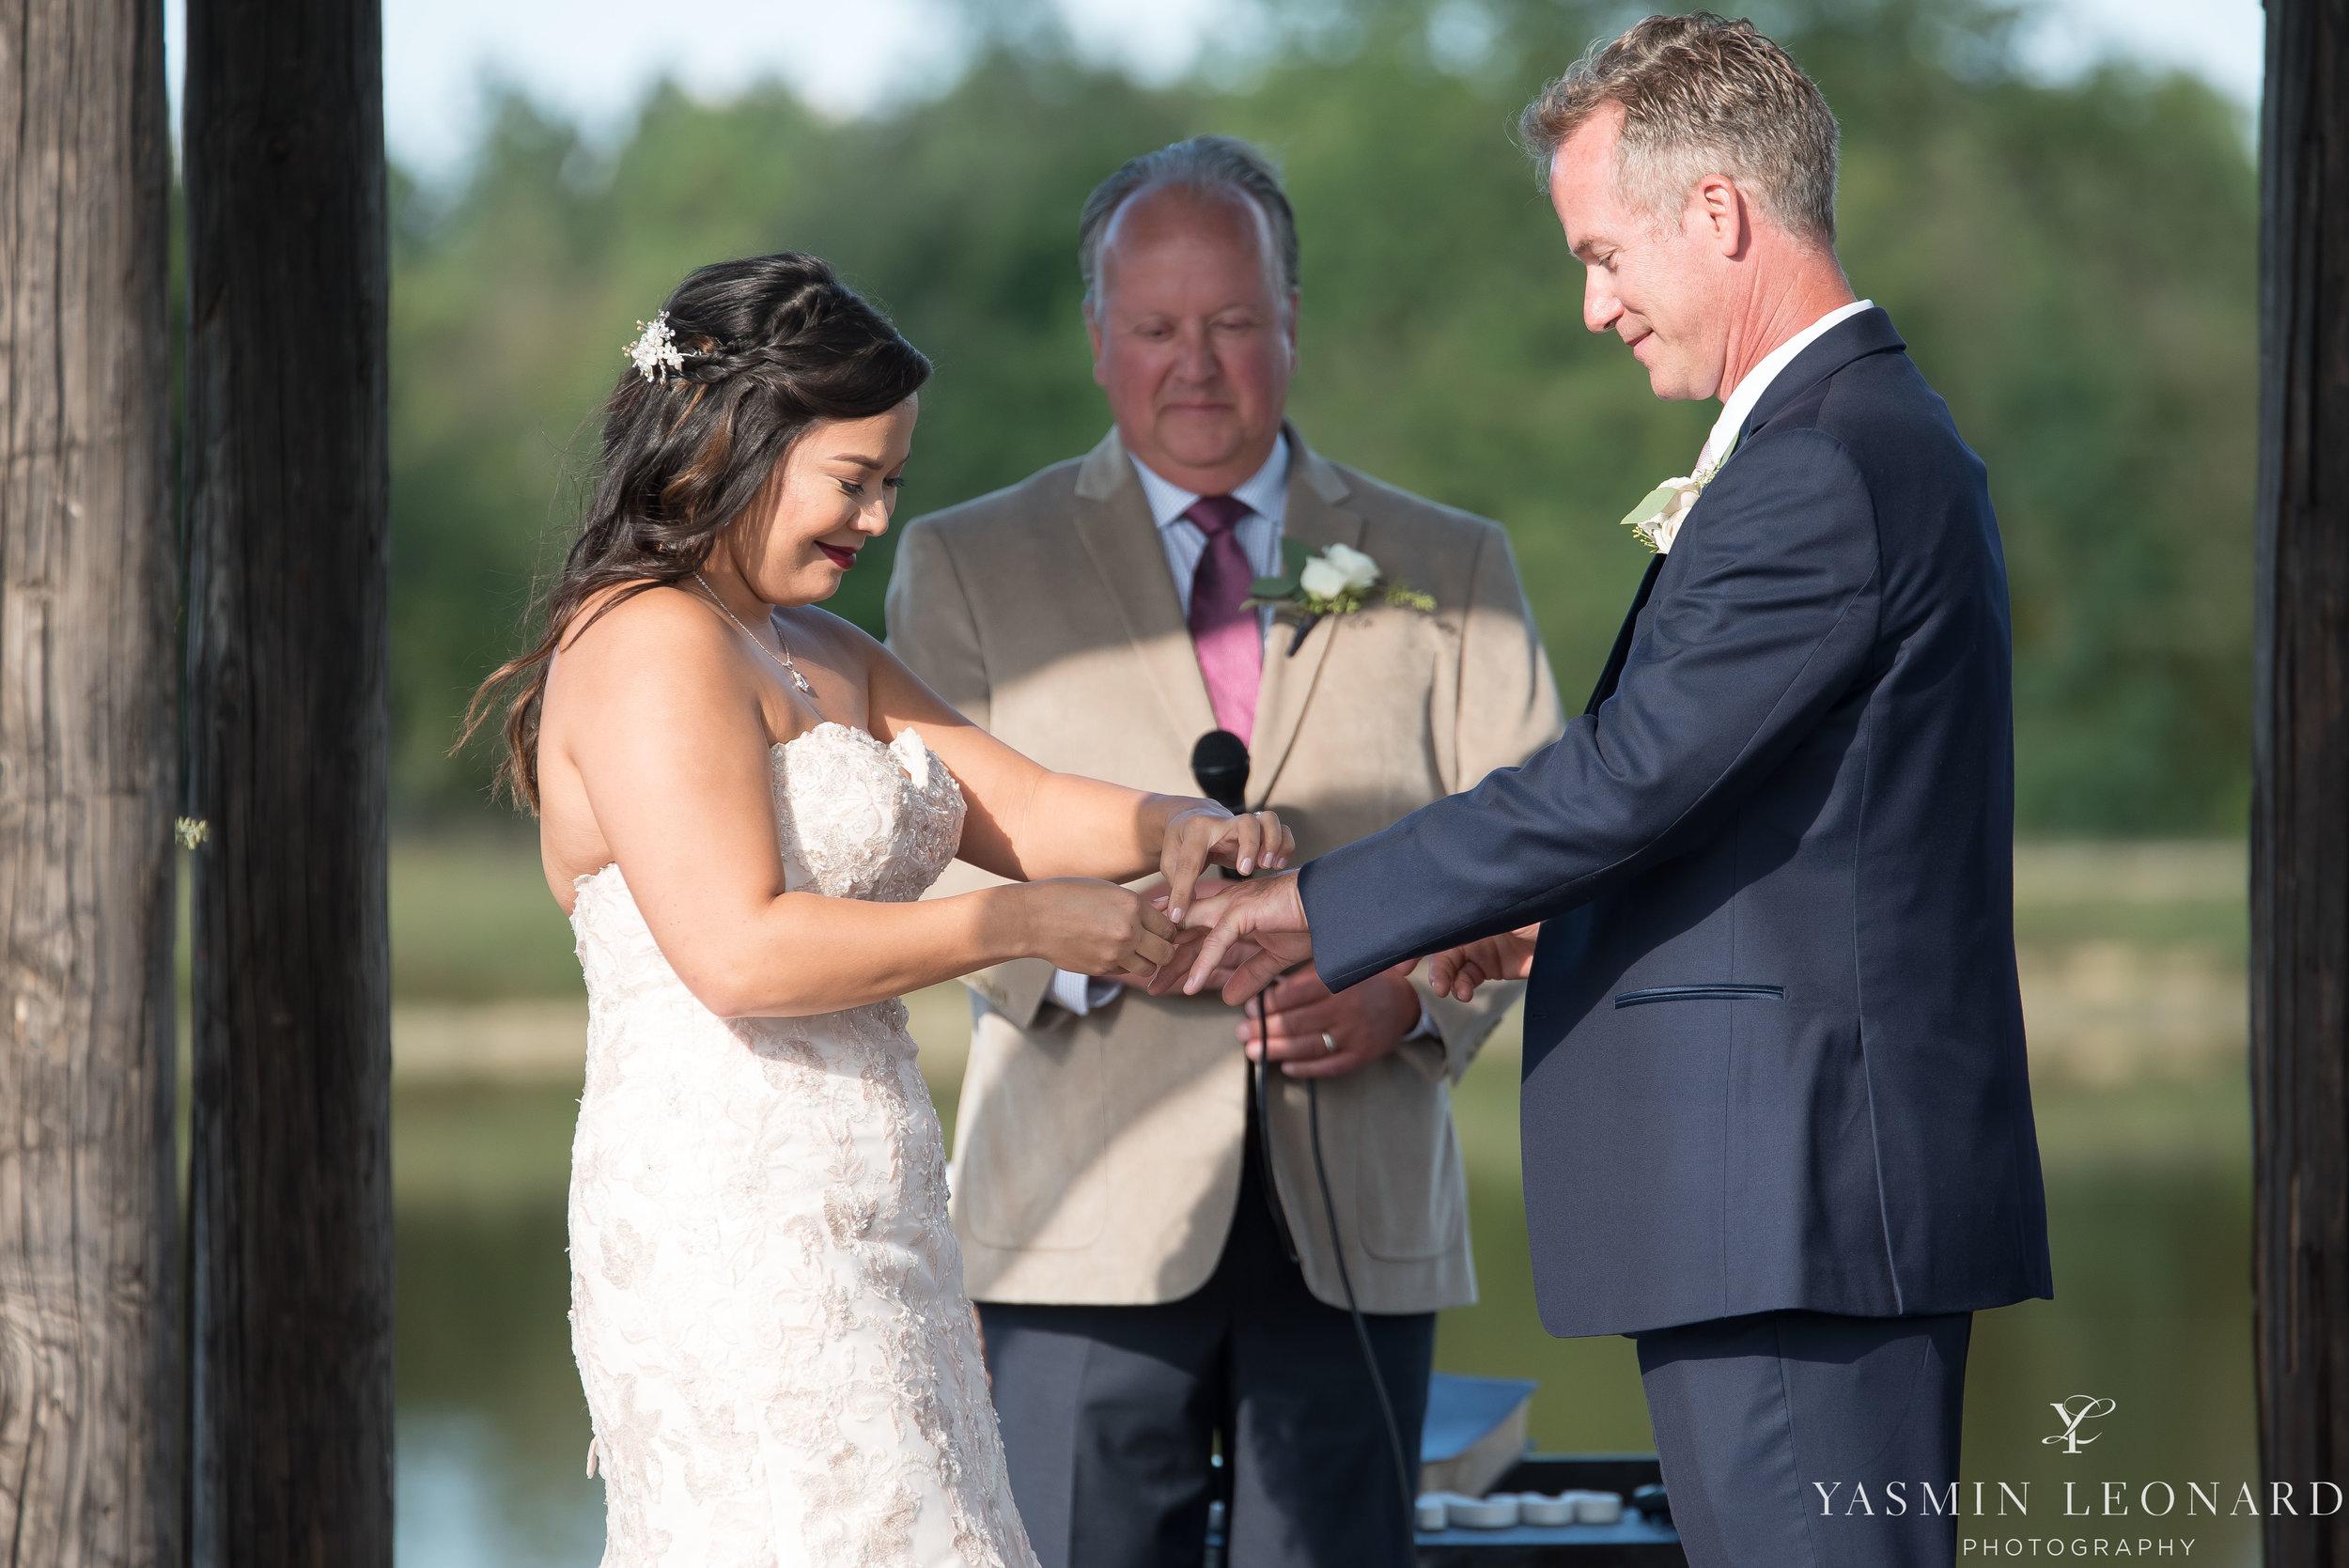 Mason Ridge   Liberty, NC   Aylissa and John   Yasmin Leonard Photography-58.jpg